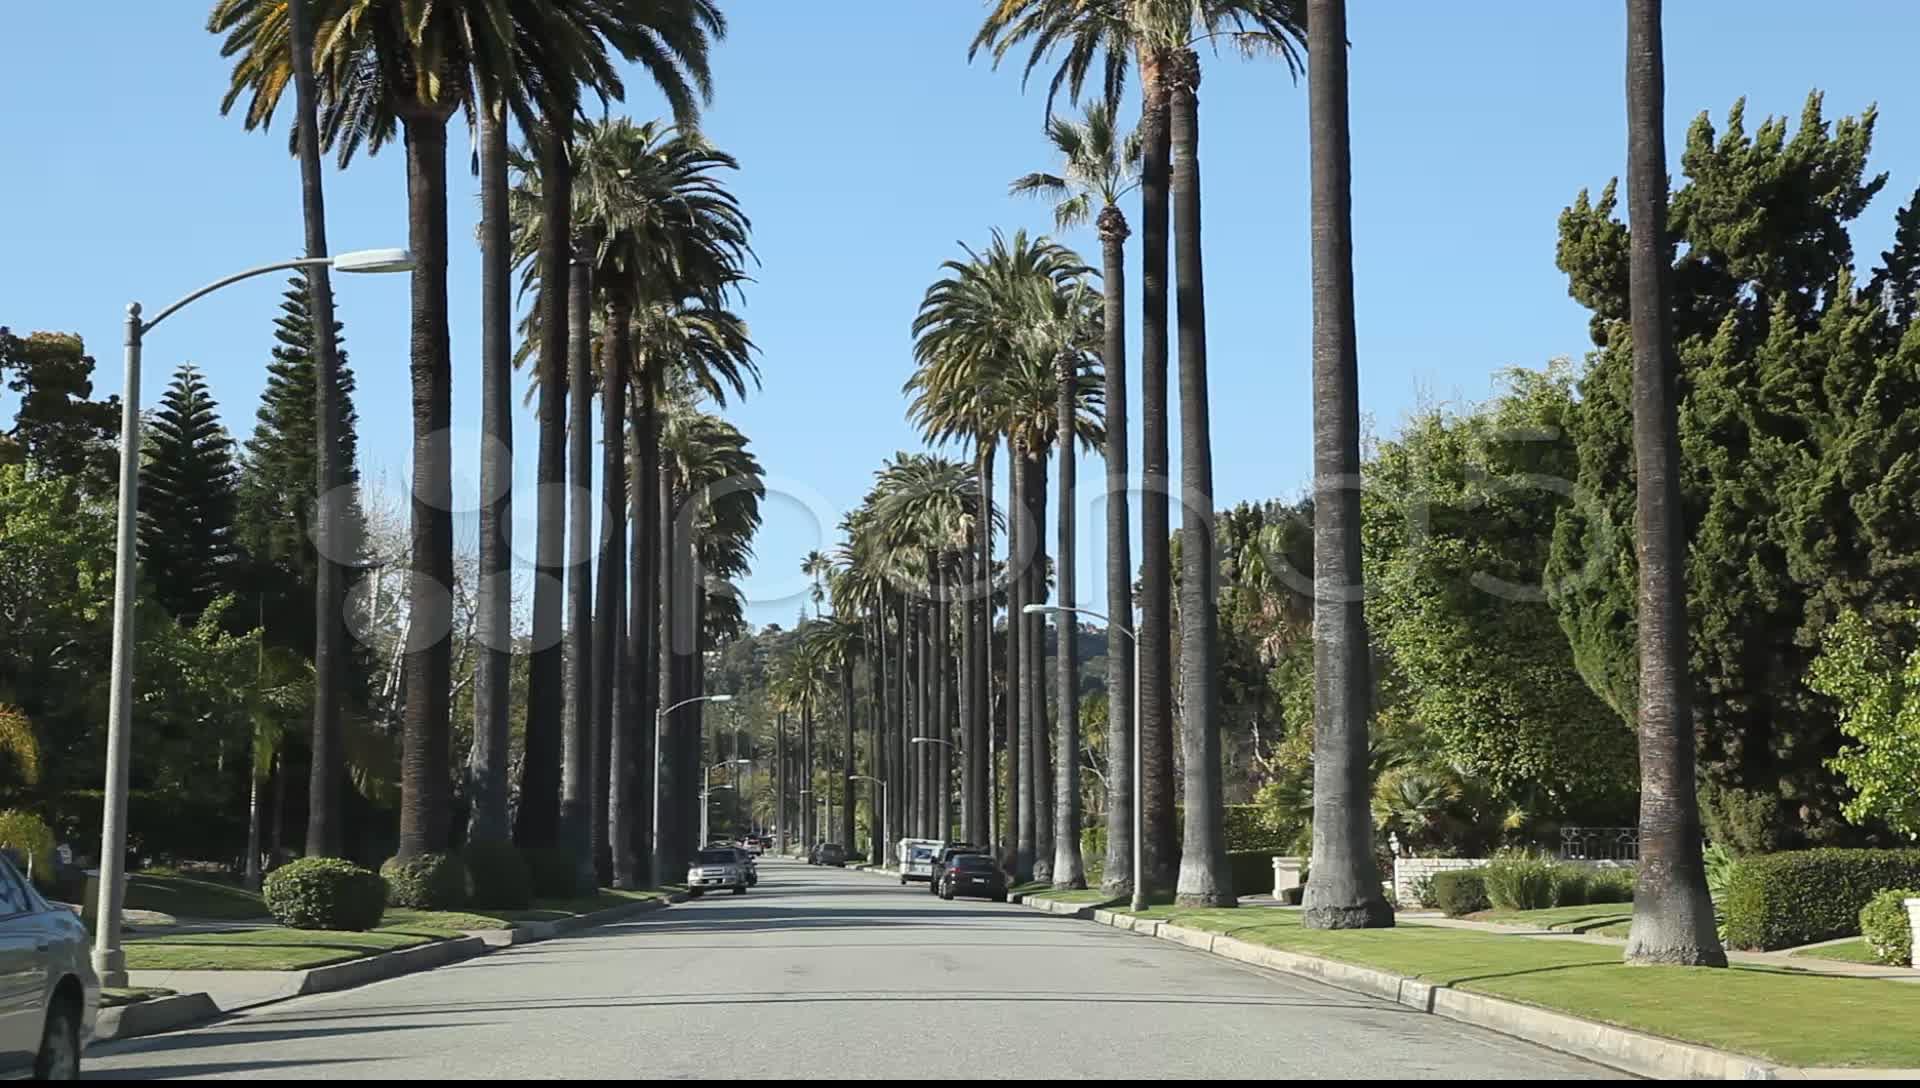 California Palm Trees Wallpapers - Top Free California ...